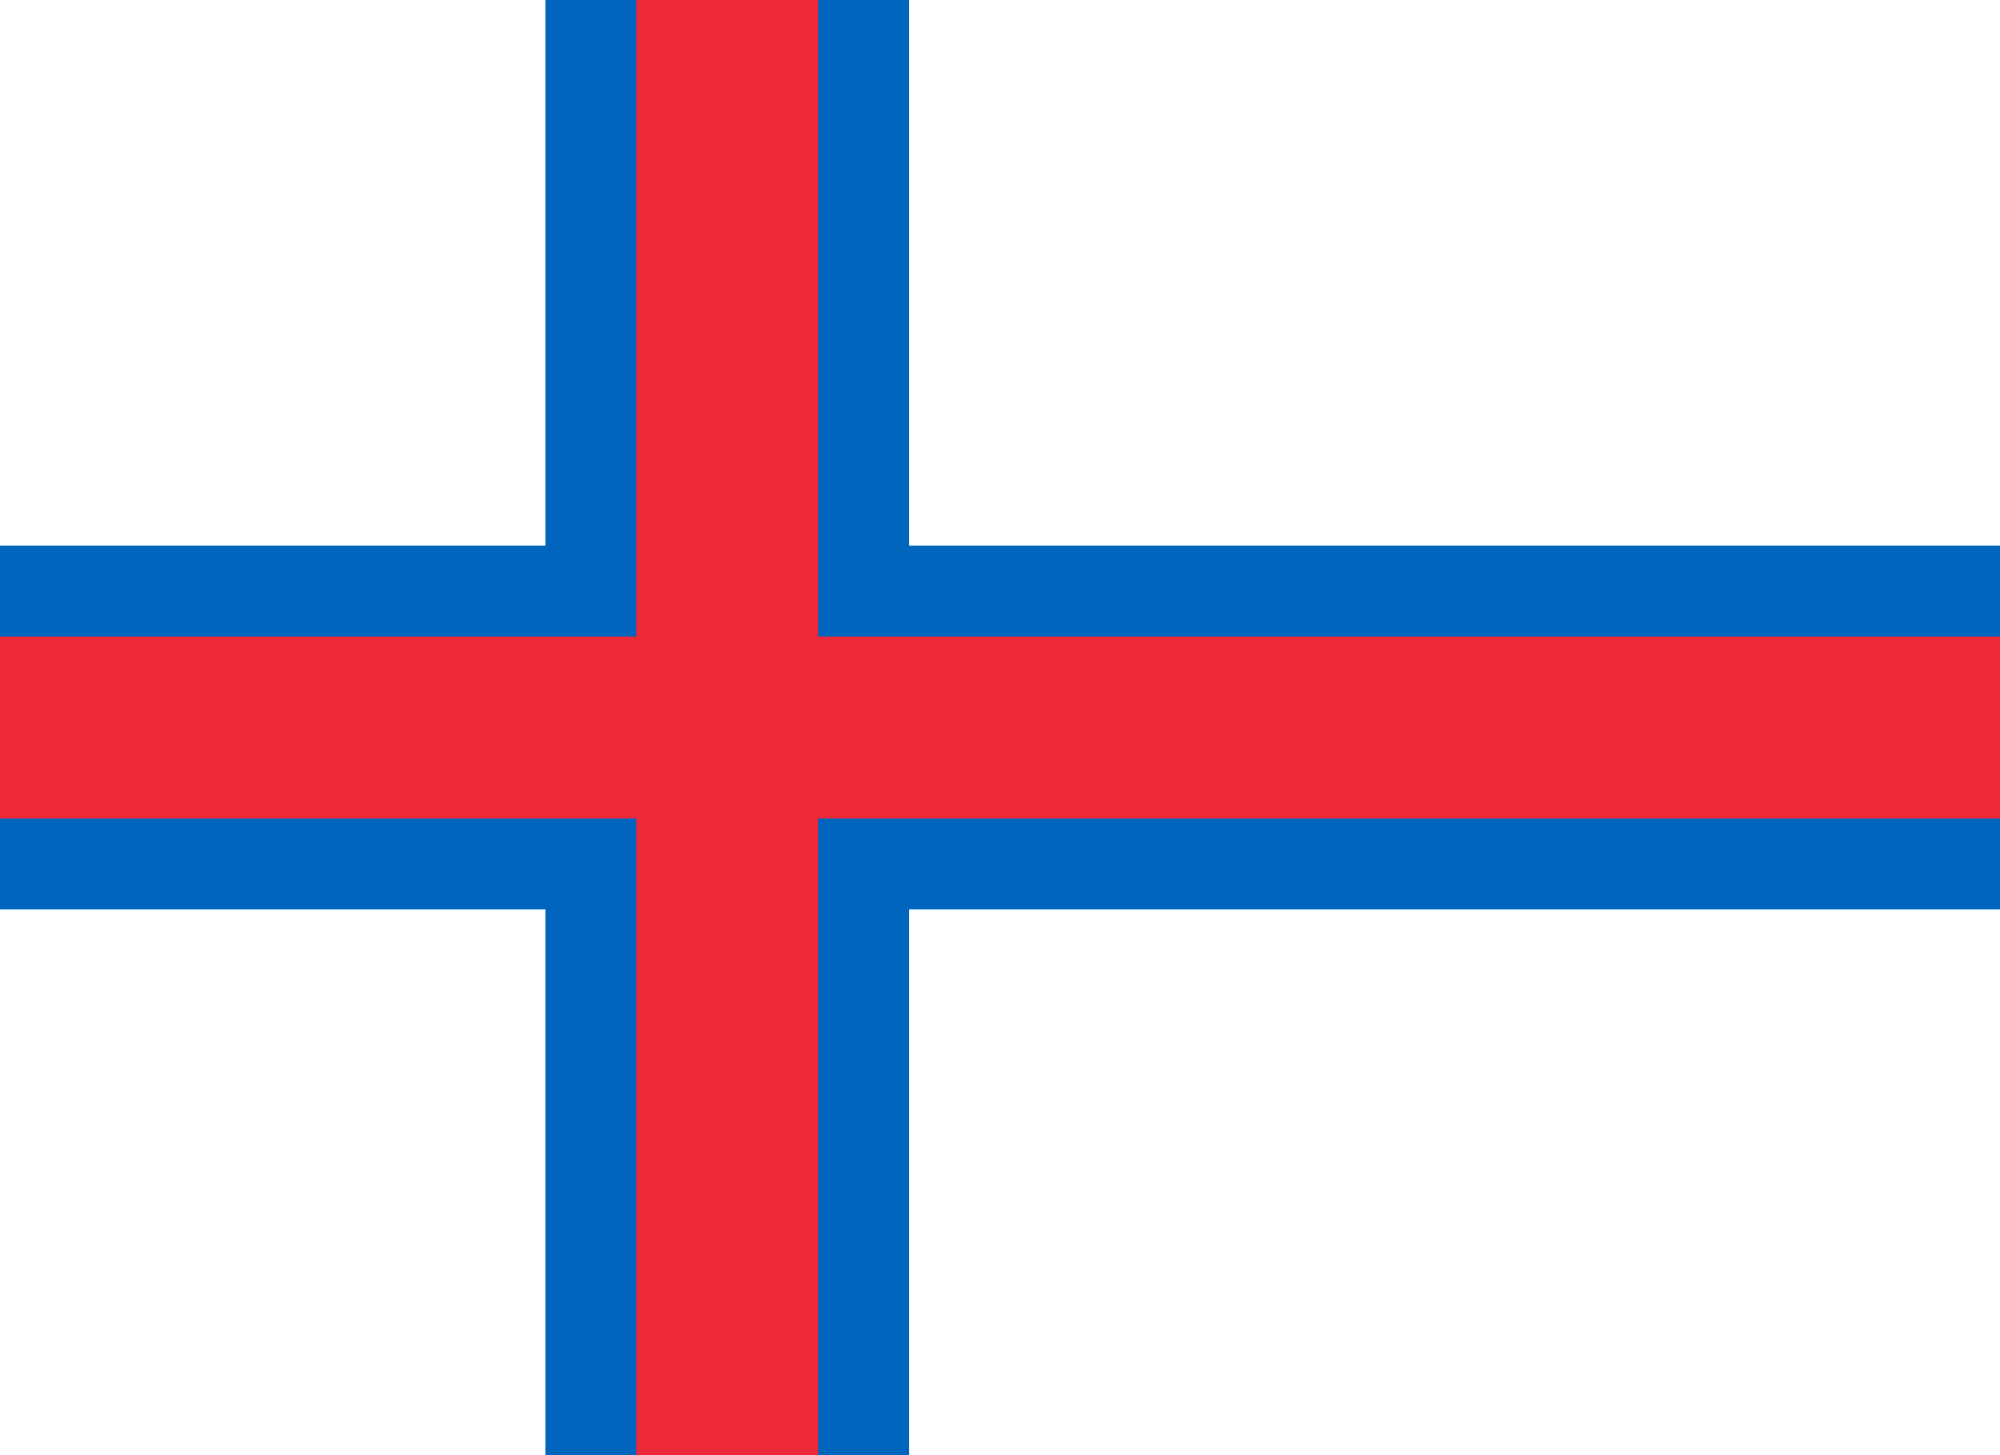 islas feroe, страна, Эмблема, логотип, символ - Обои HD - Профессор falken.com